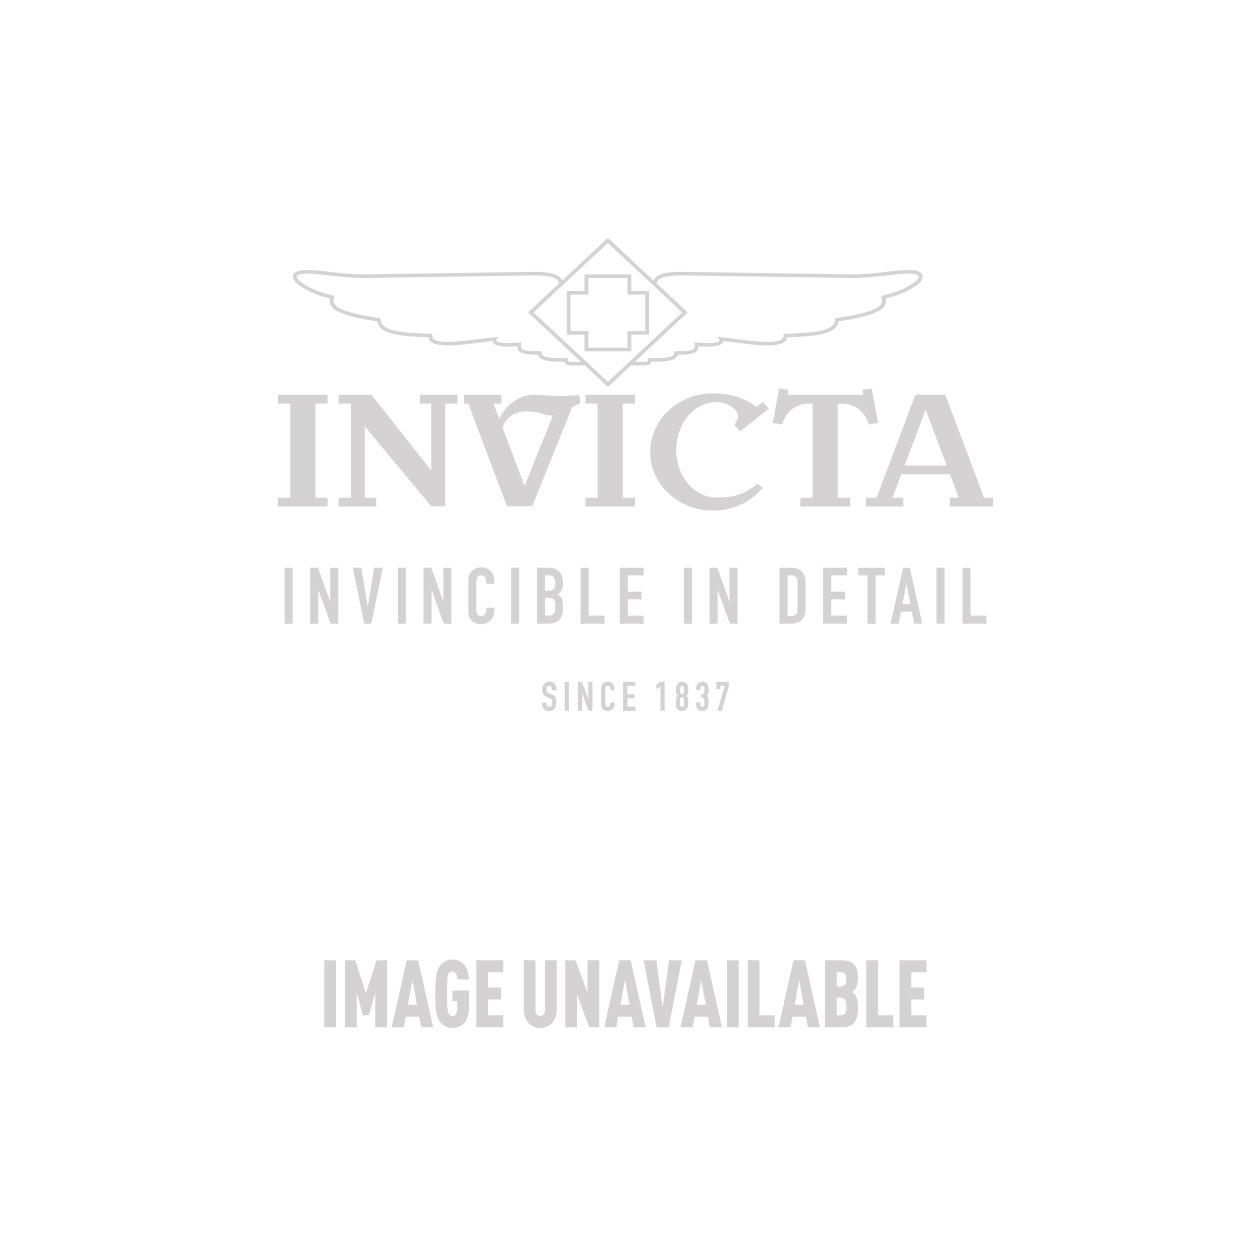 Invicta Wildflower Quartz Watch - Rose Gold case with White tone Silicone band - Model 21381